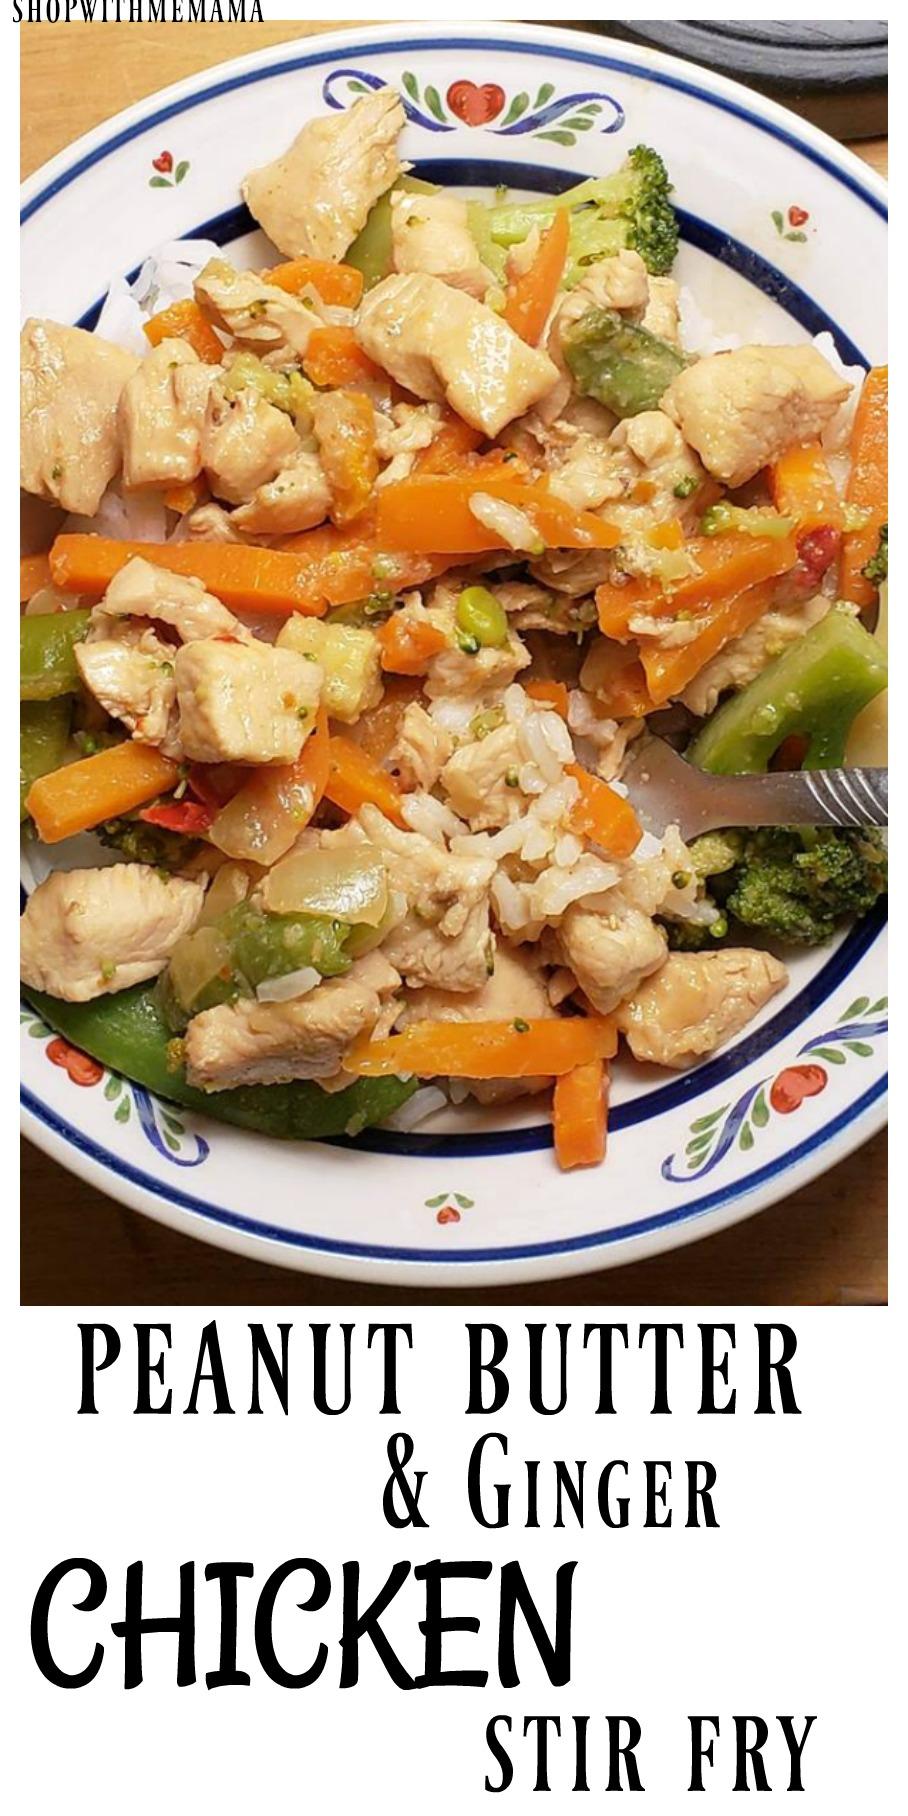 Peanut Butter Chicken Stir Fry